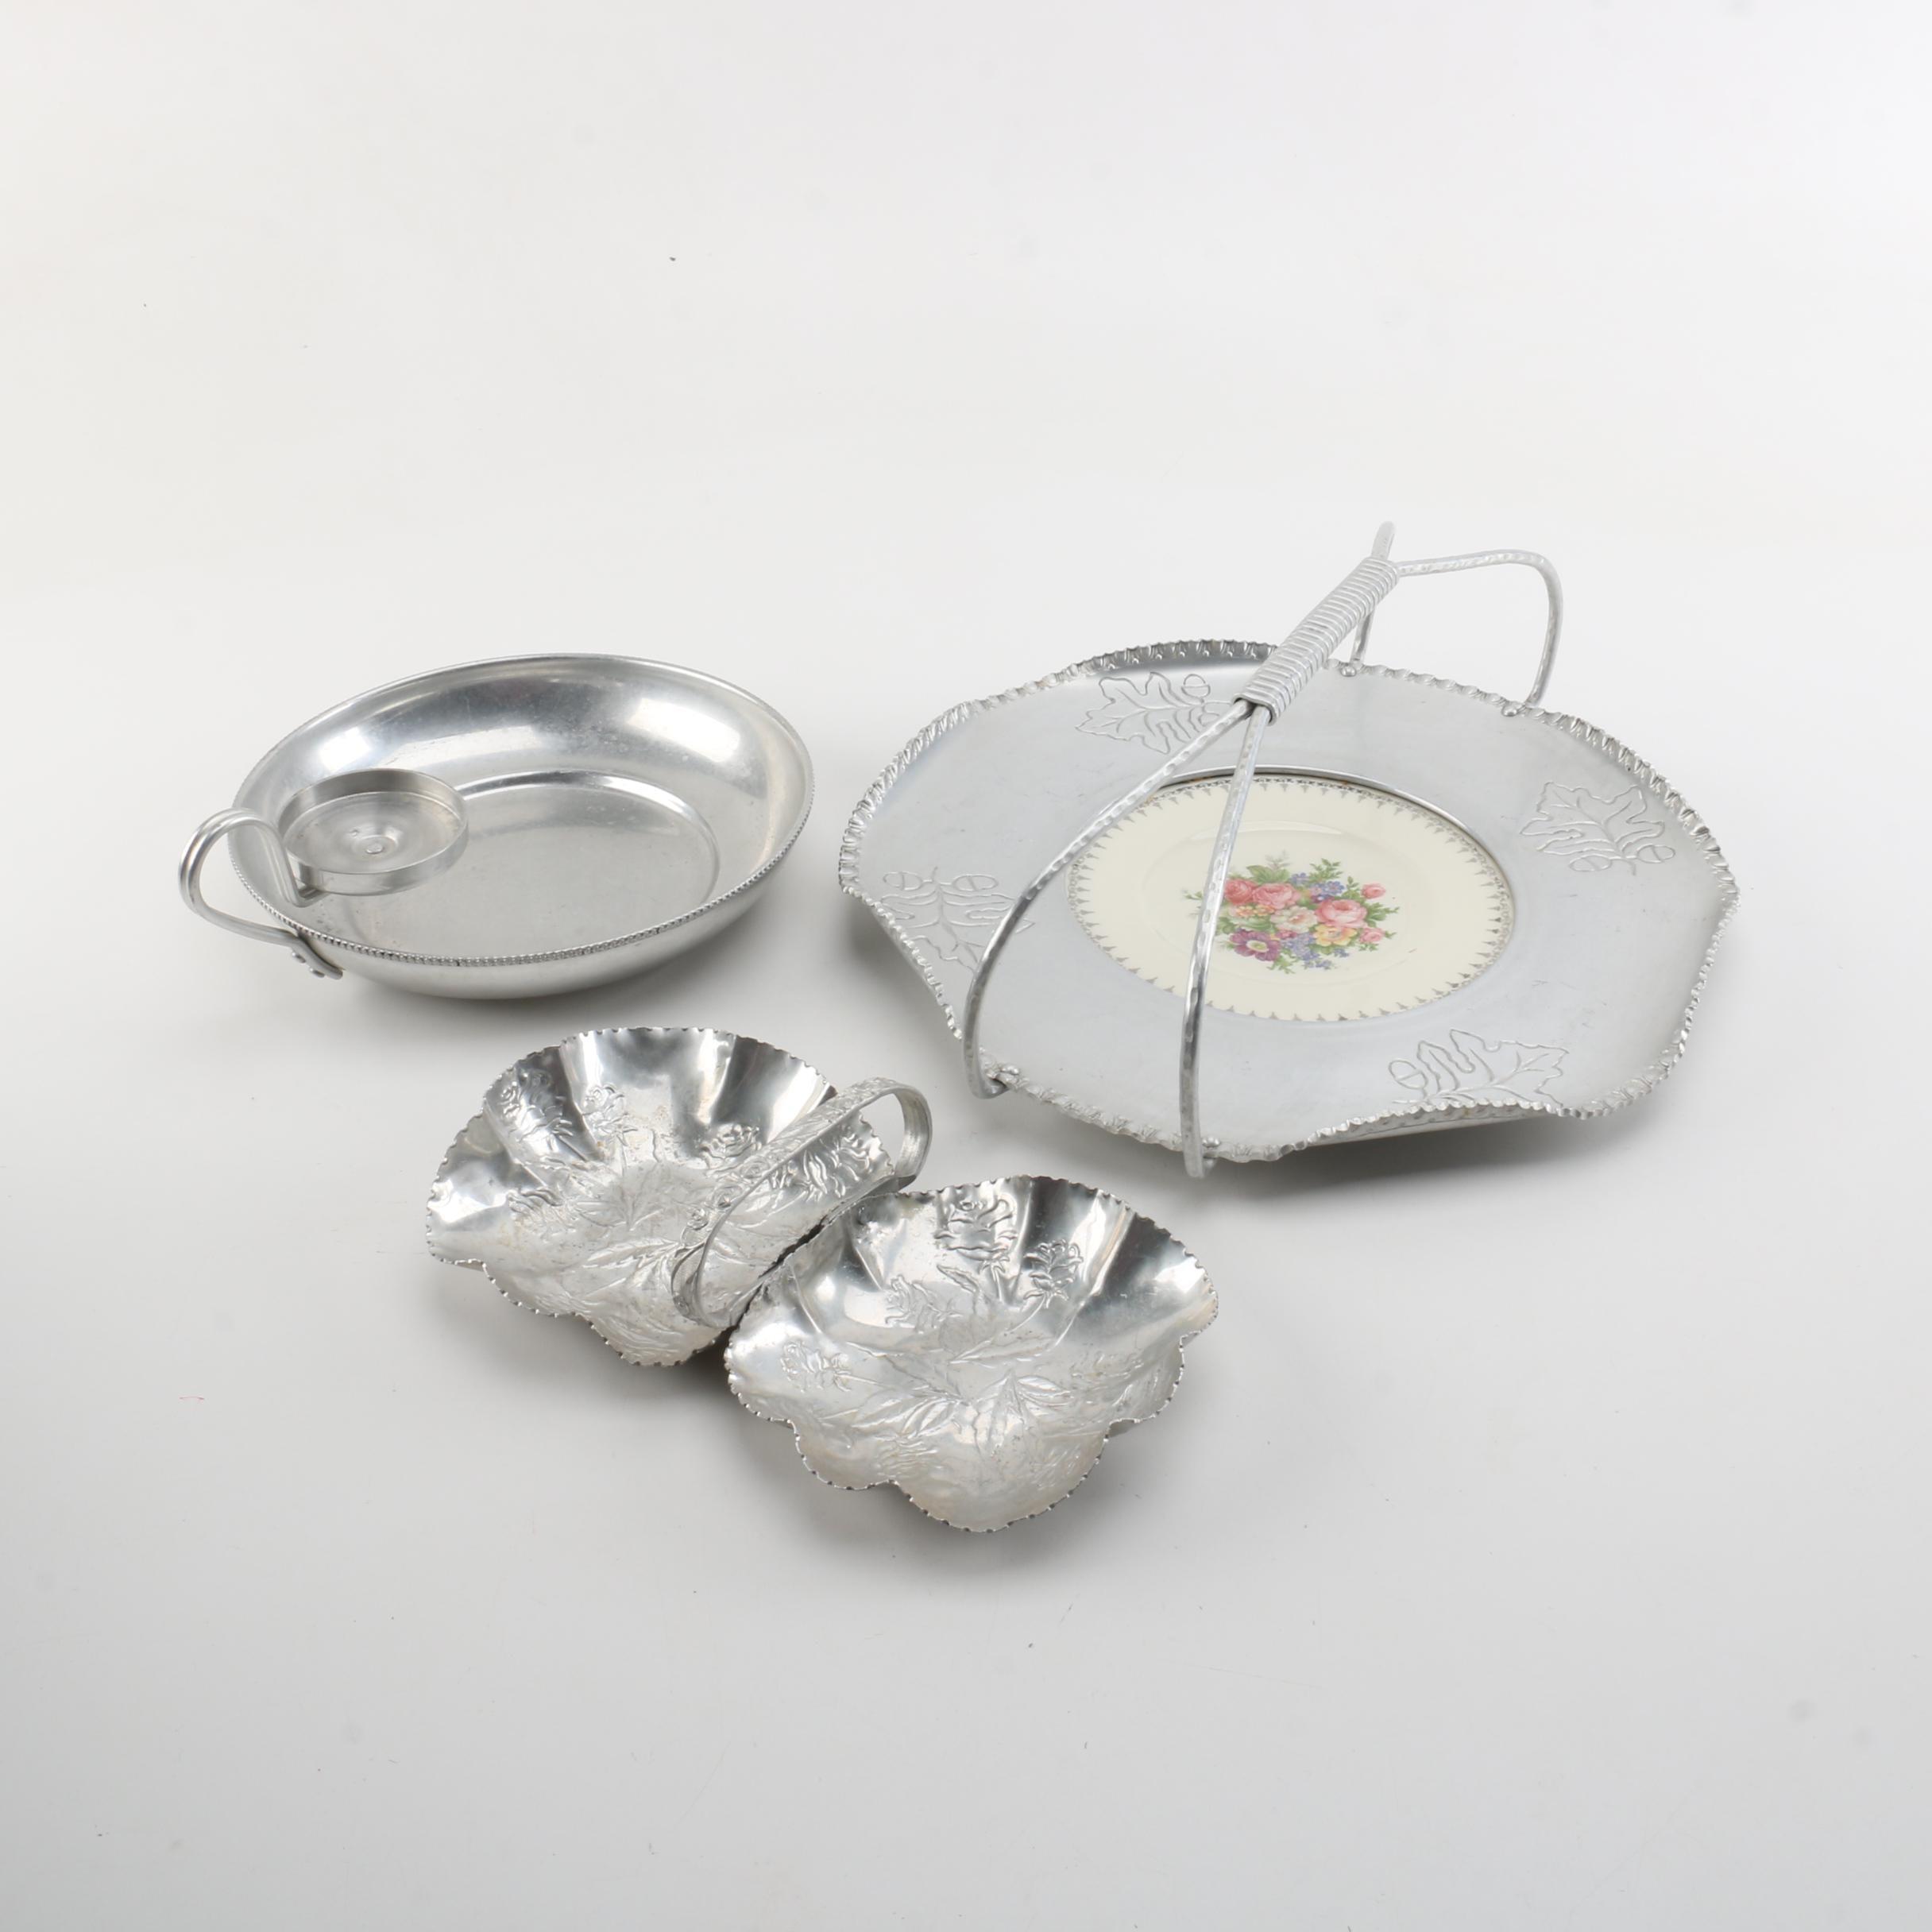 Vintage Aluminum Serving Dishes Including Buenilum